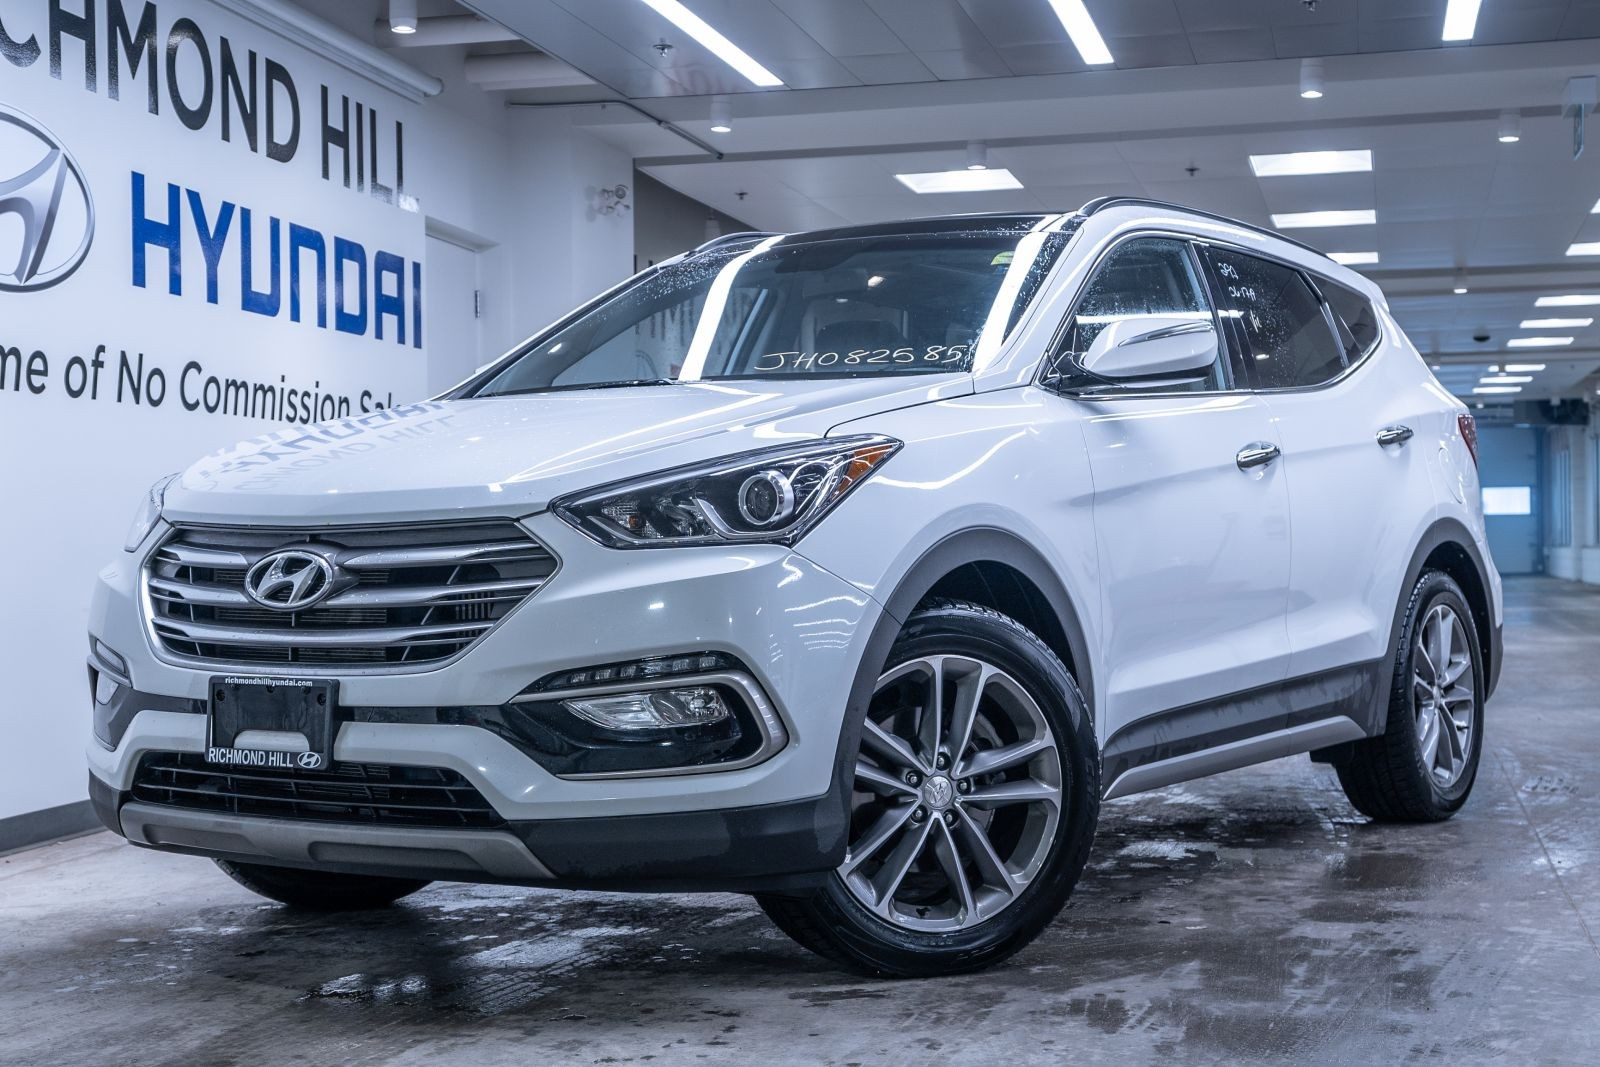 Richmond Hill Hyundai | Used Inventory